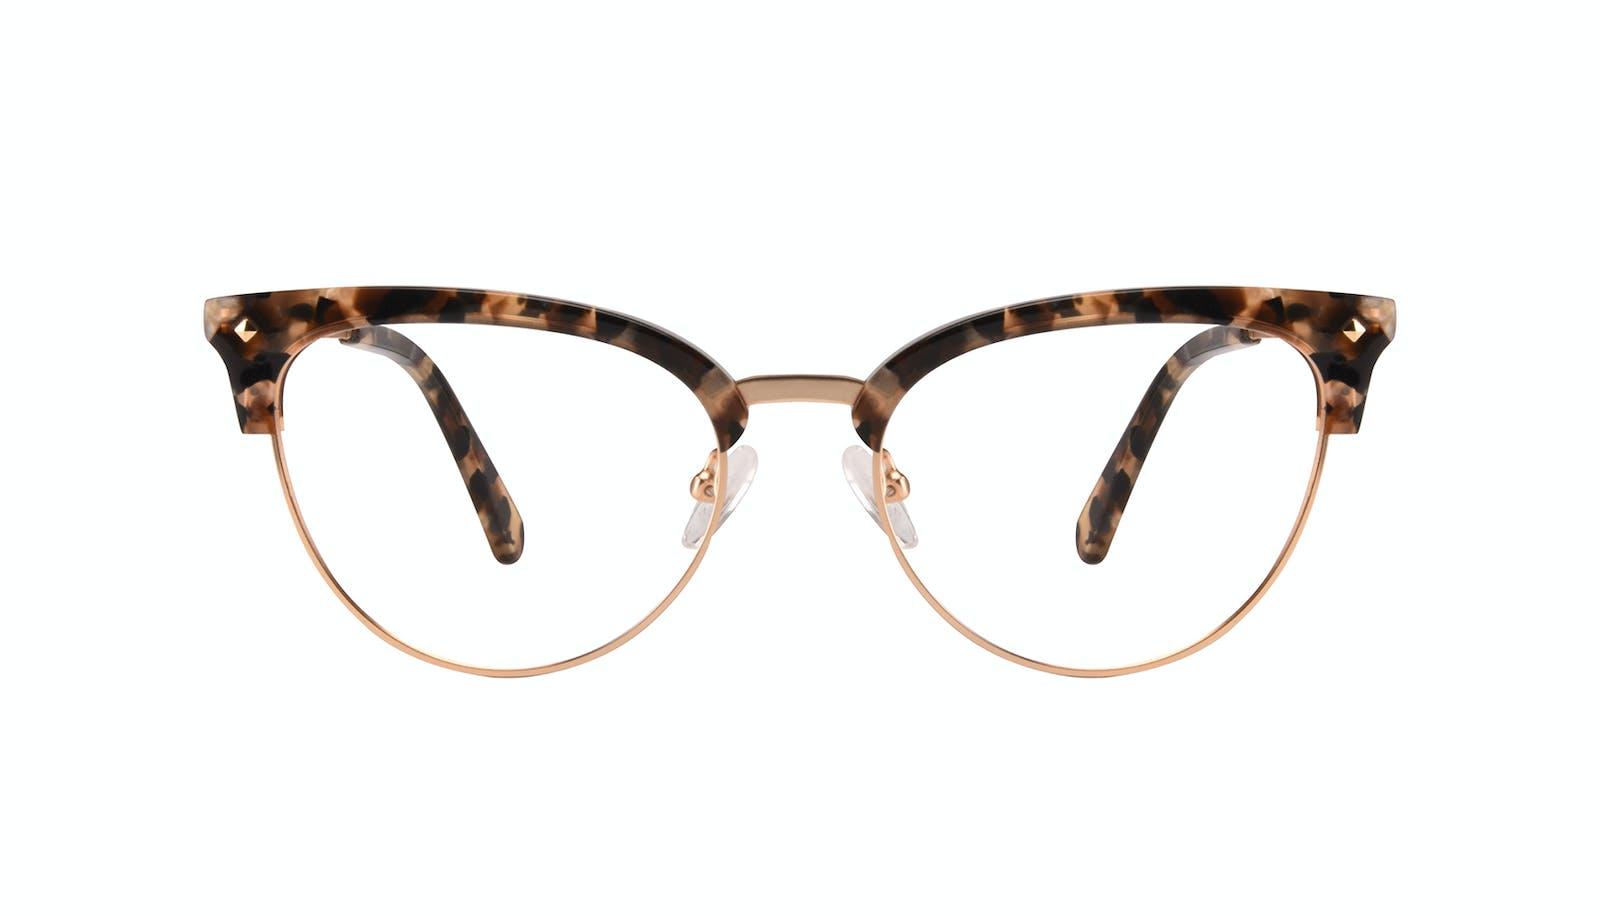 c6d732ab52ab Affordable Fashion Glasses Cat Eye Daring Cateye Eyeglasses Women Moon Gold  Flake